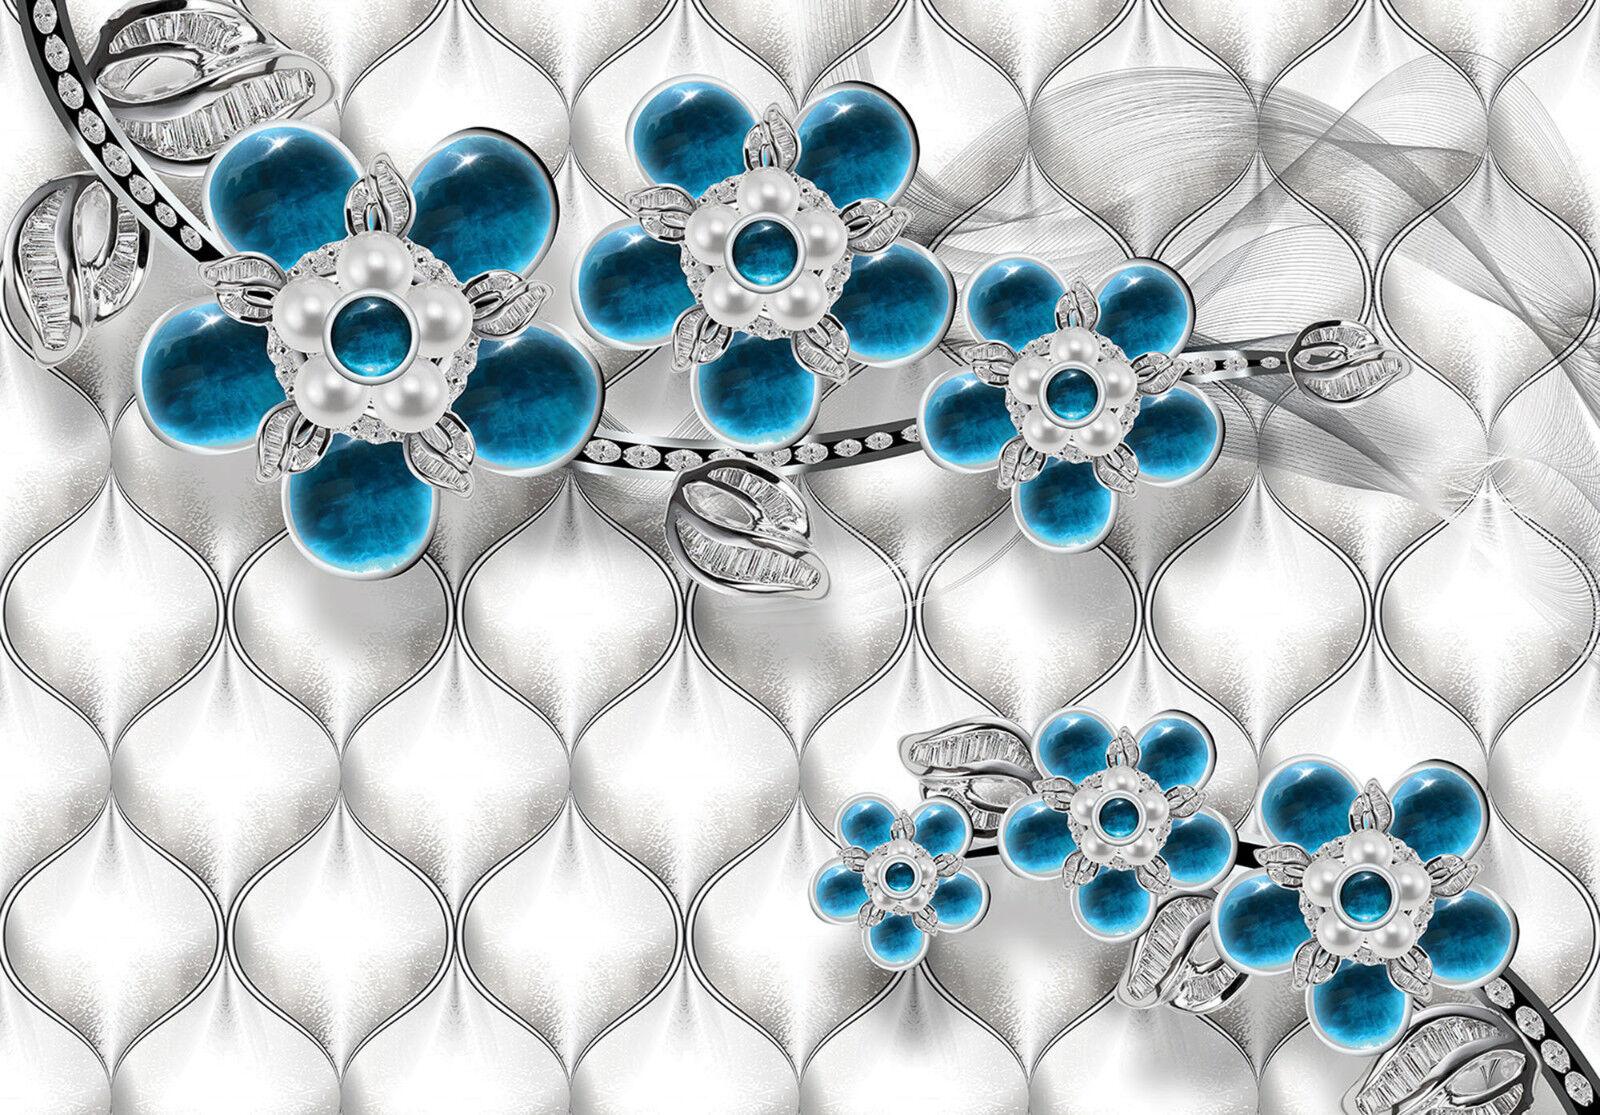 VLIES Fototapete-LUXUS DESIGN-(12059)-3D Blaumen Muster Abstrakt Perlen Diamanten